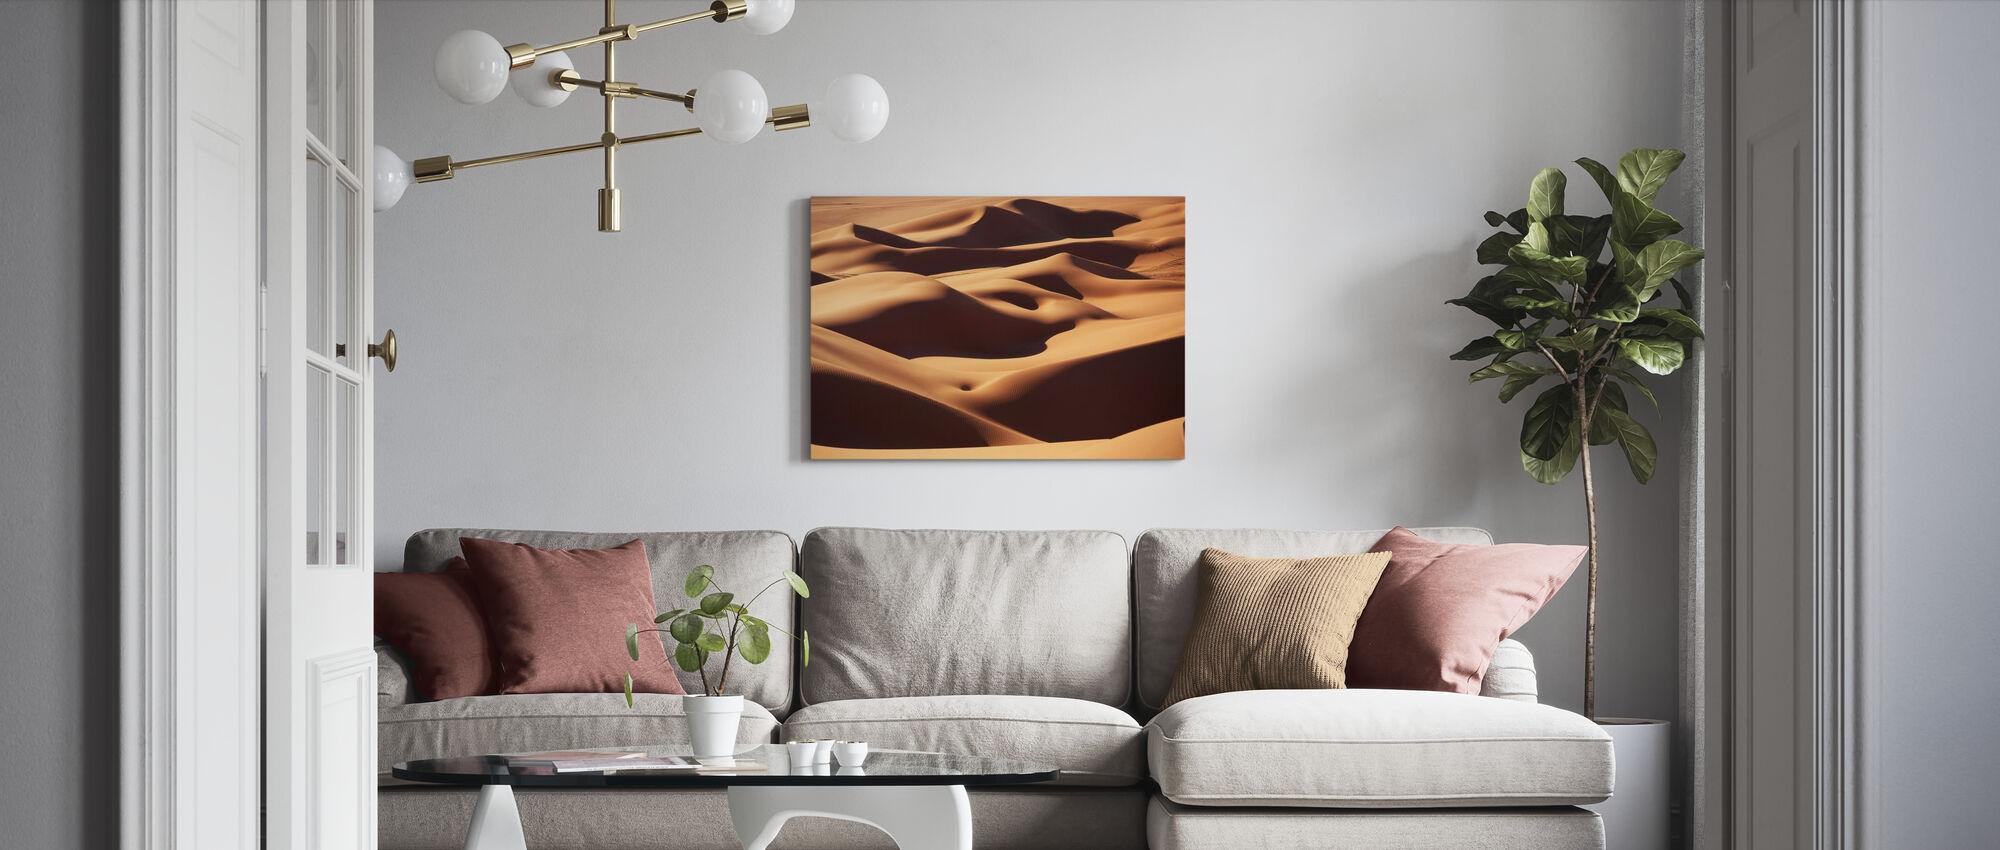 Sand Landscape - Canvas print - Living Room